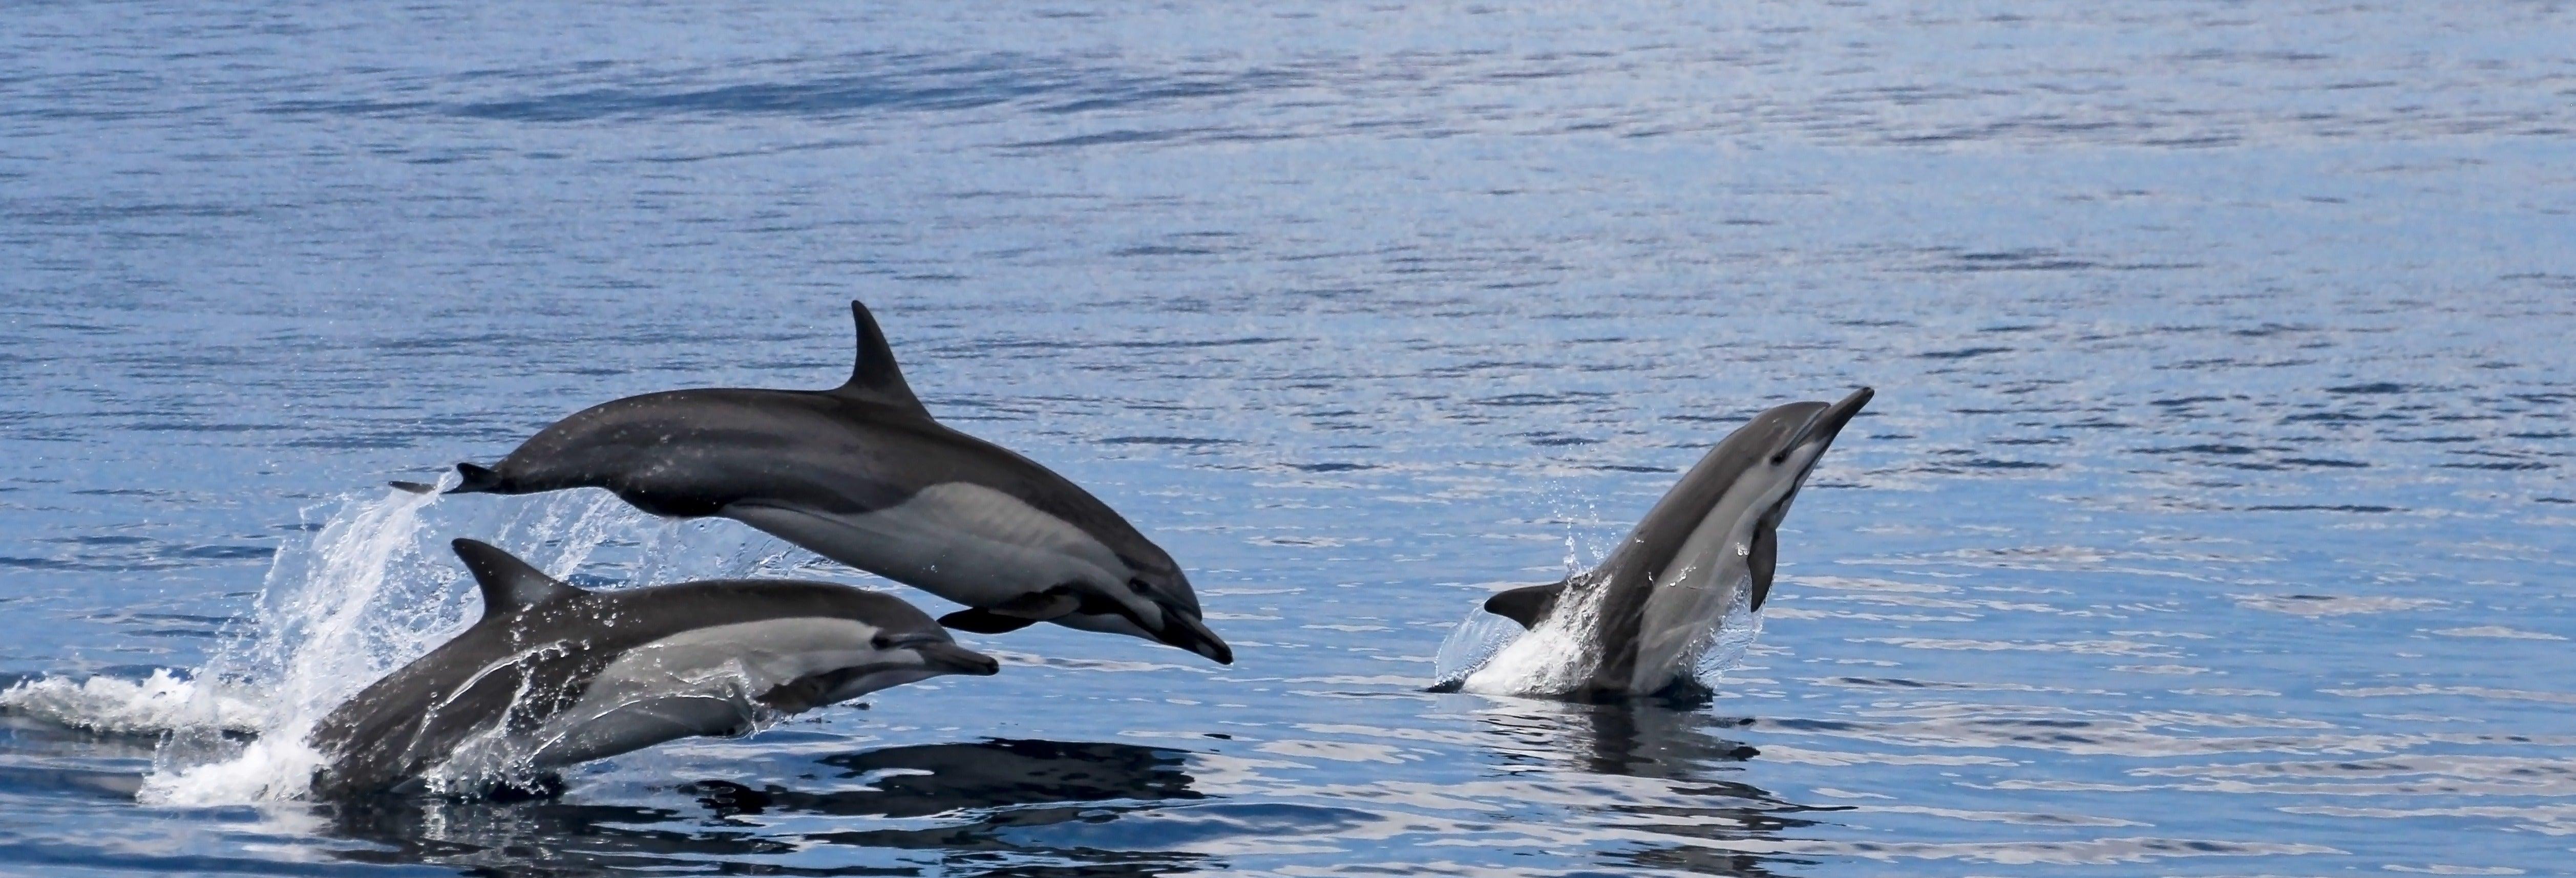 Observation de dauphins et de baleines